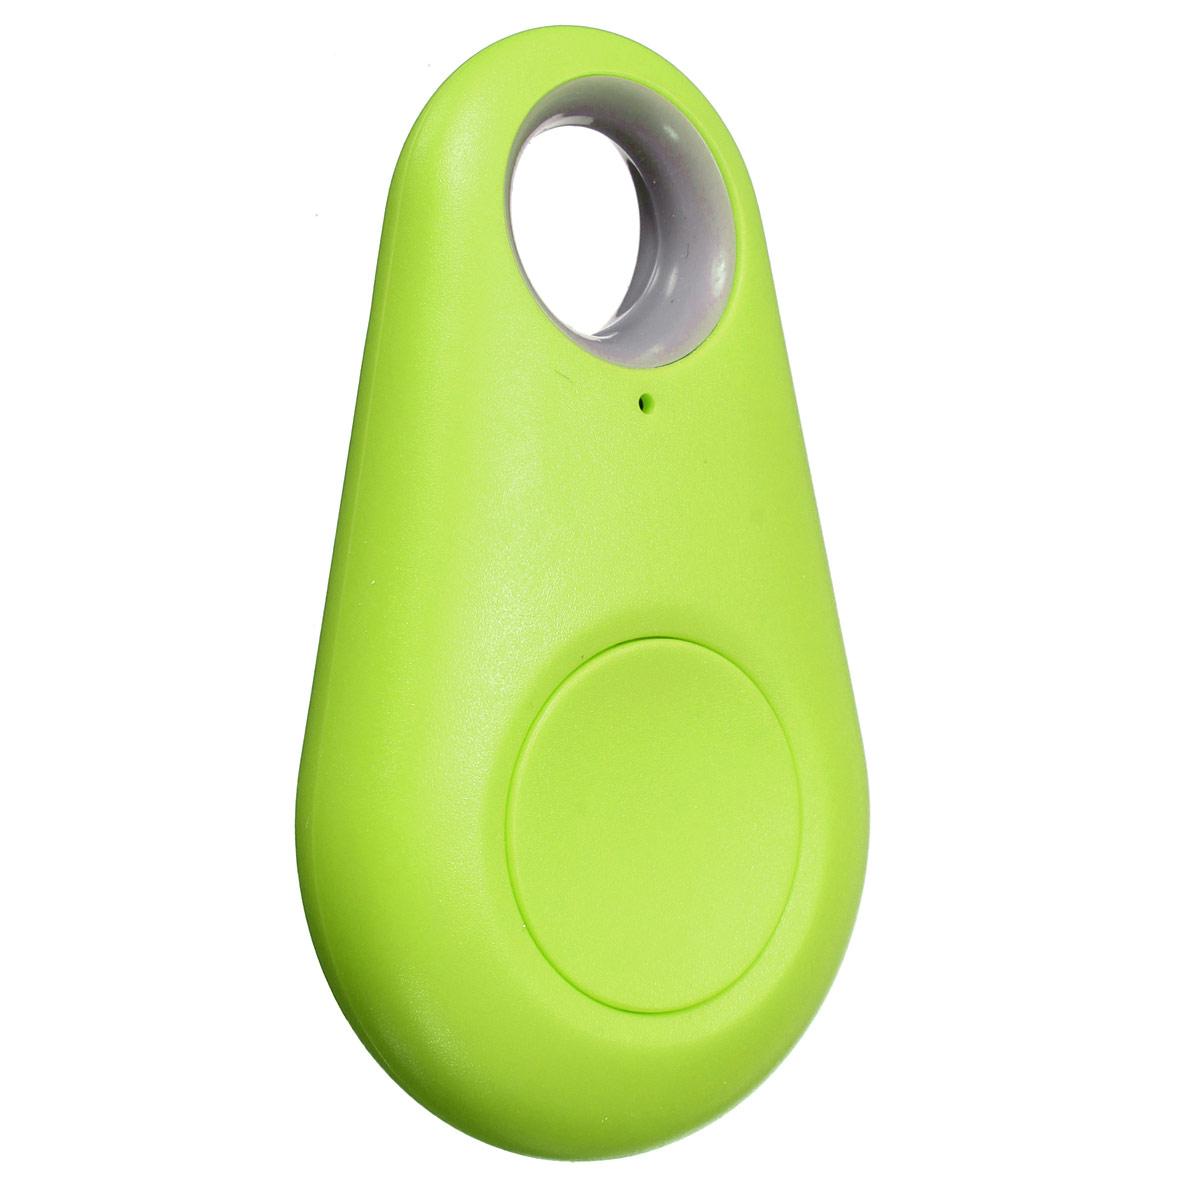 bluetooth 4 0 traceur gps locator tag alarme antivol anti perdu pour phone cl s ebay. Black Bedroom Furniture Sets. Home Design Ideas